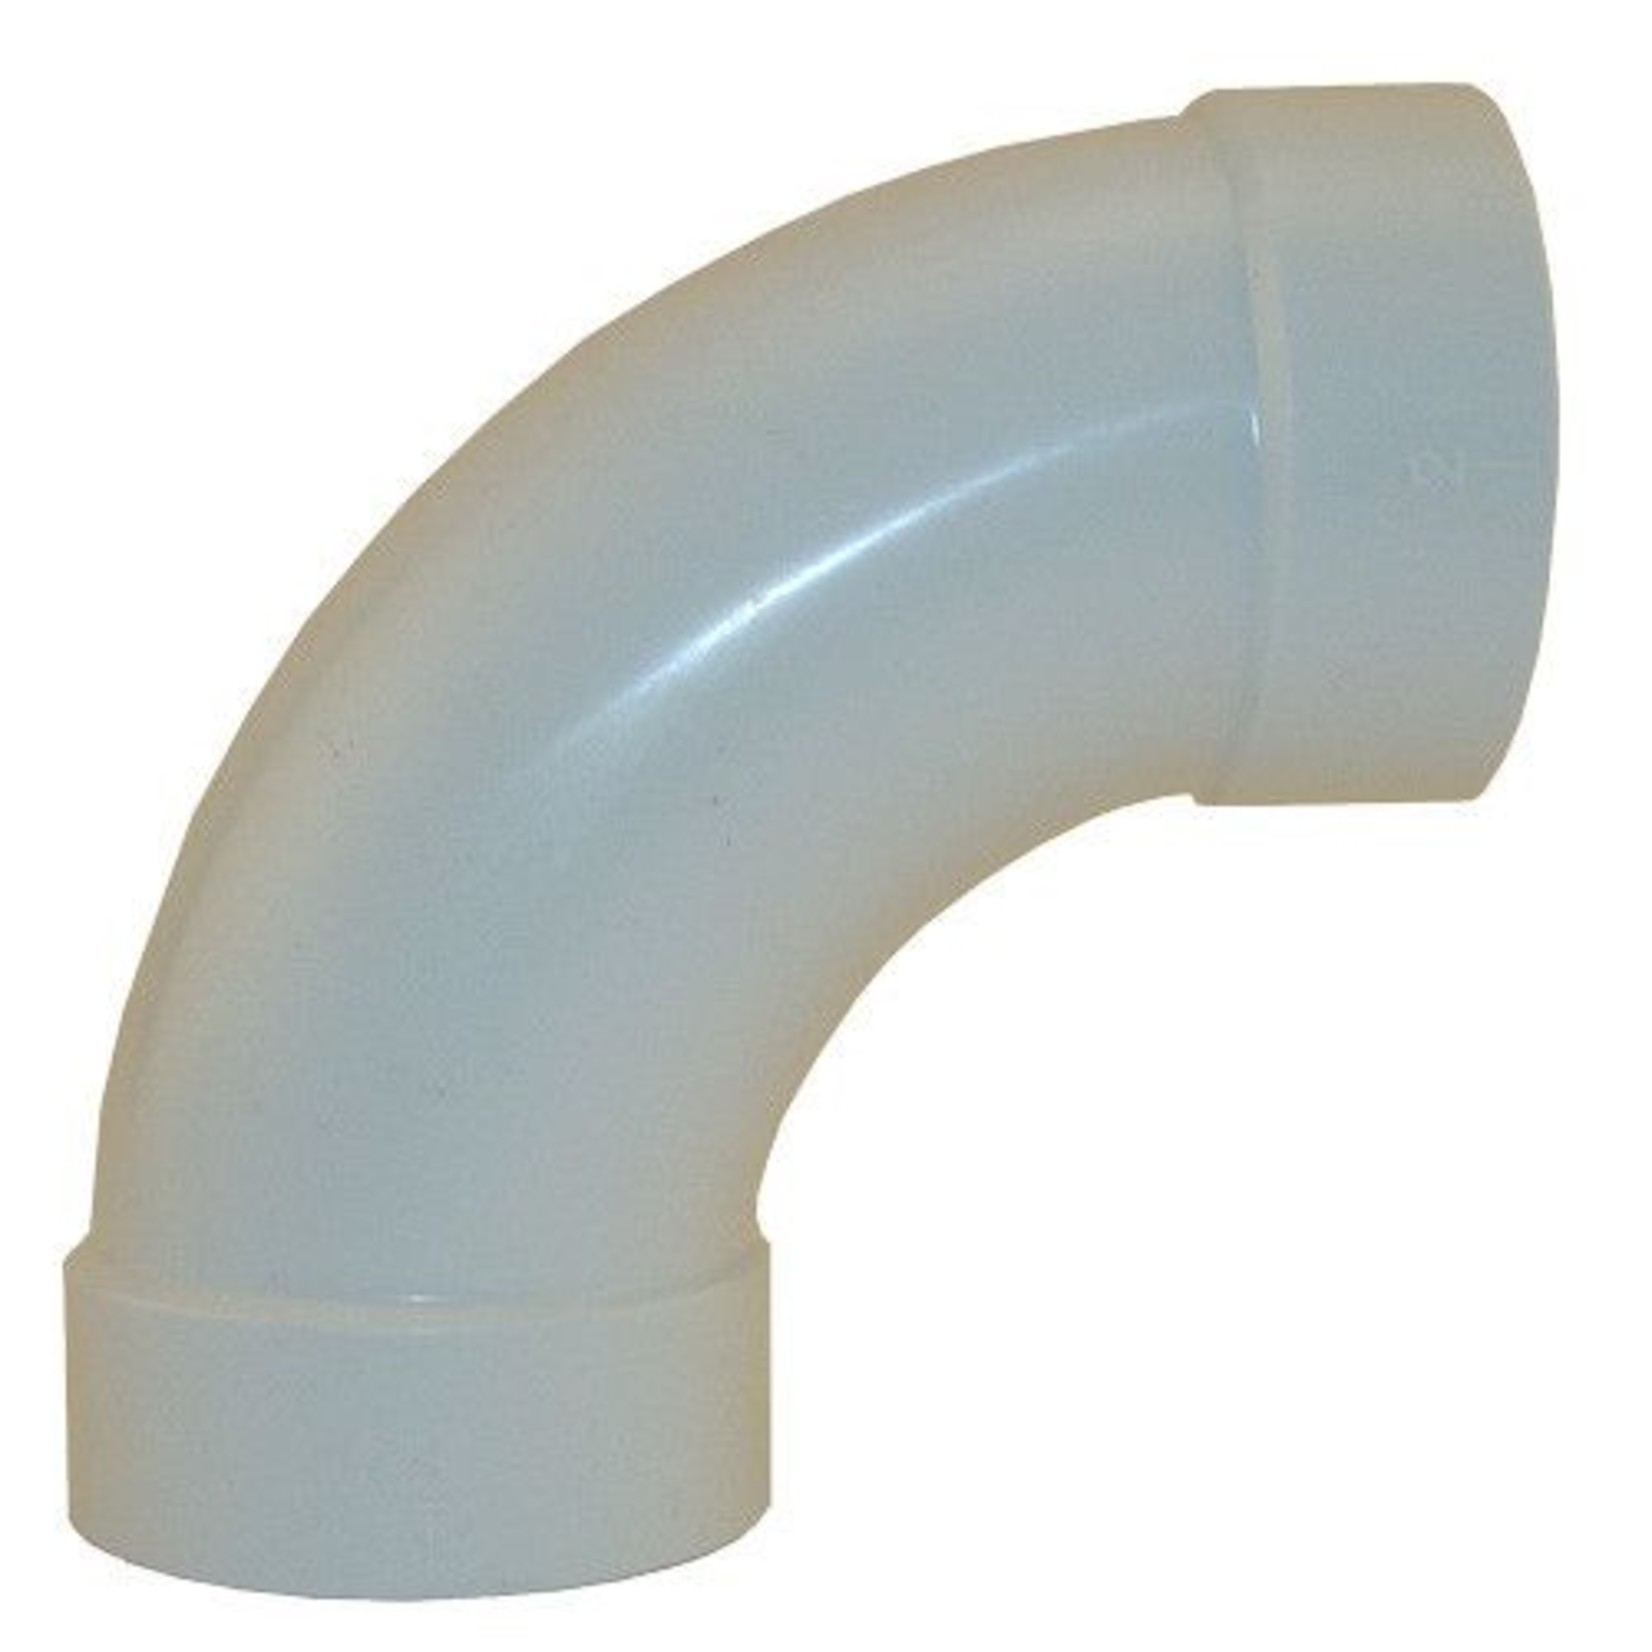 Plastiflex Central Vacuum Sweep 90 Fitting - (Box of 115pcs)